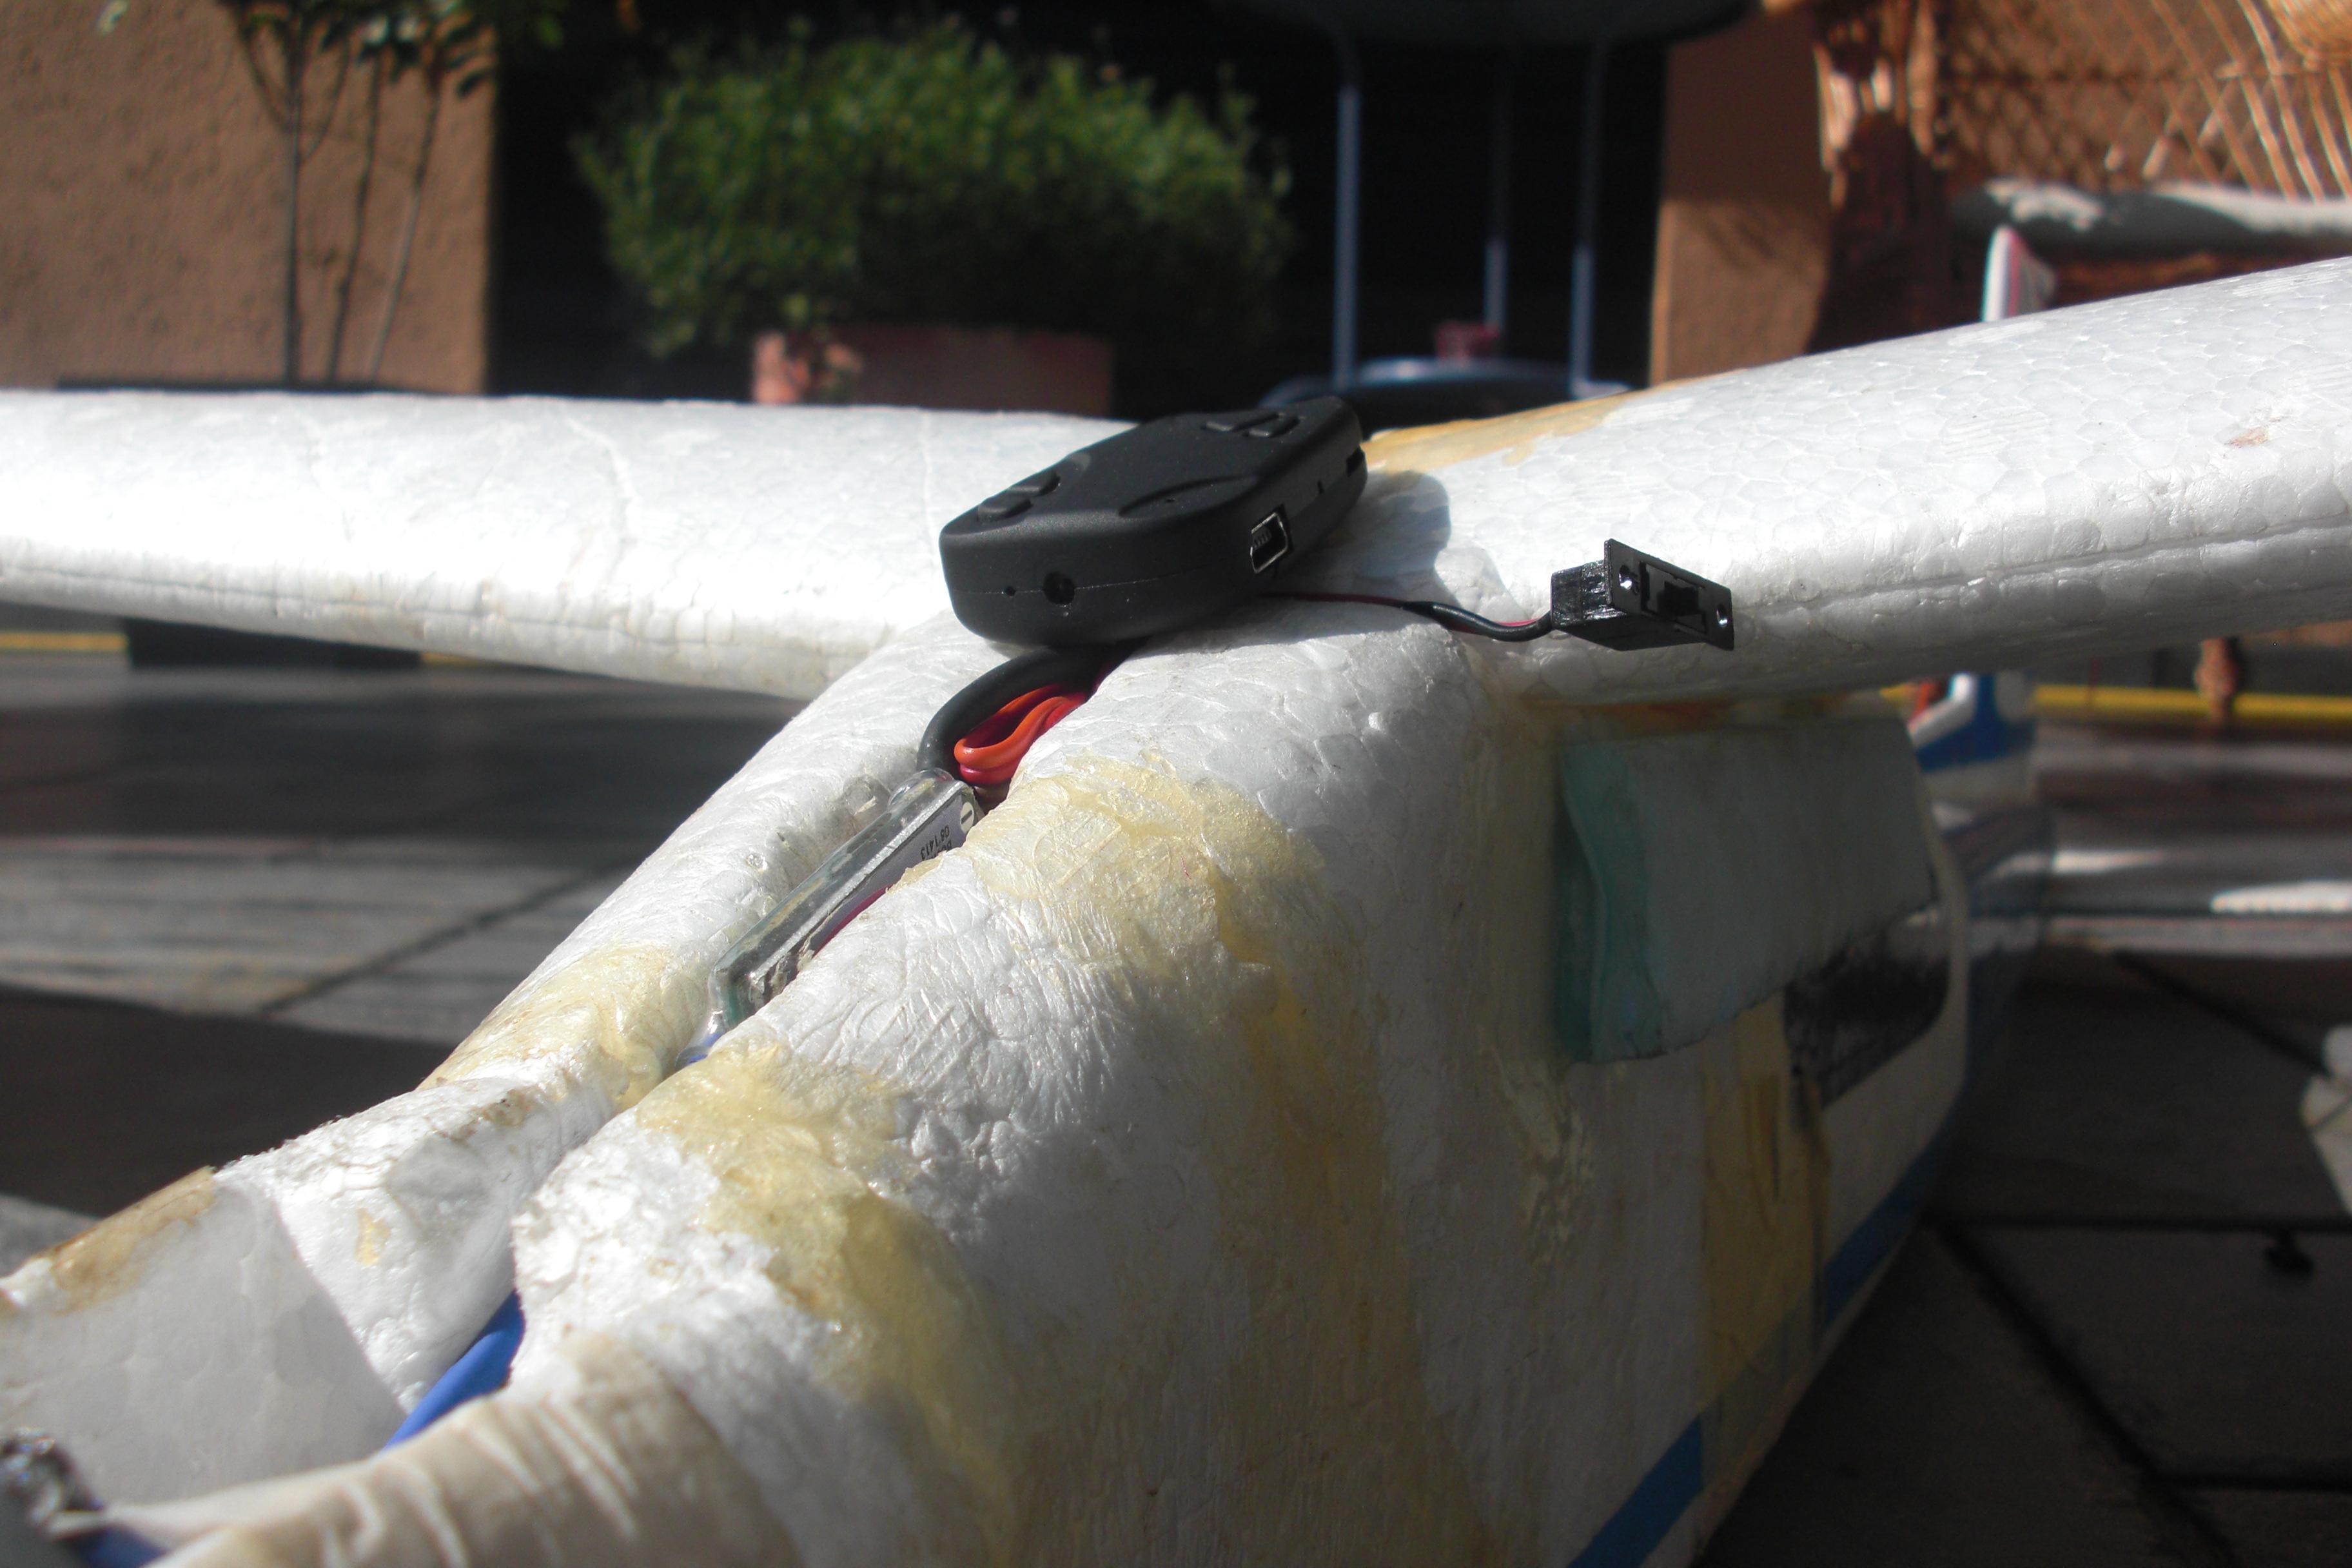 Modellflugzeug mit Kamera